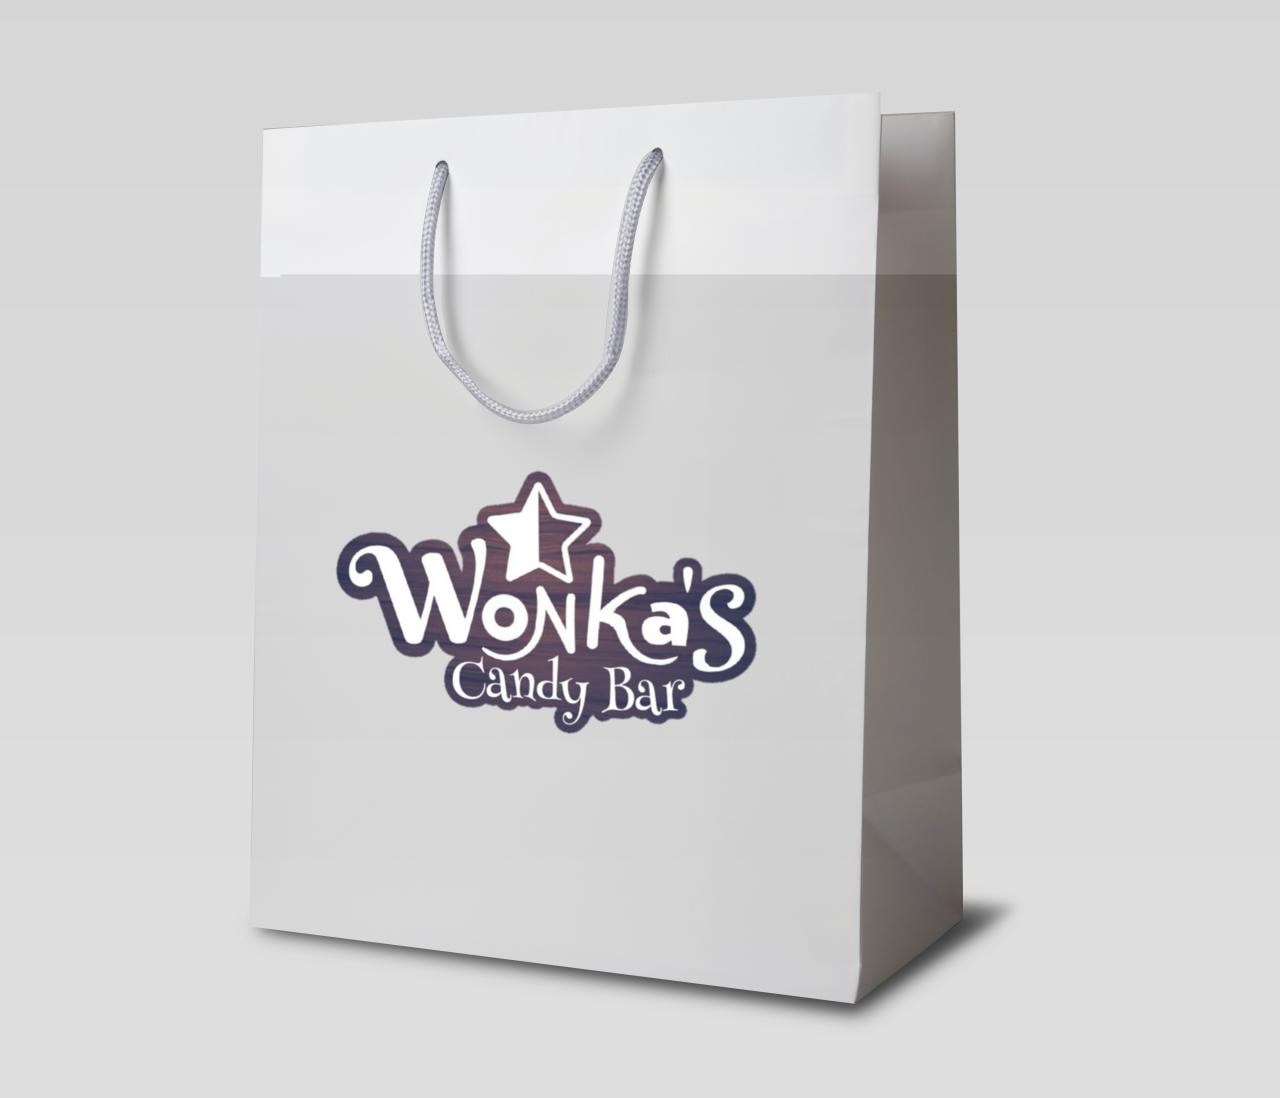 Разработка логотипа магазина сладостей со всего мира. фото f_6075a298c2d4997e.png